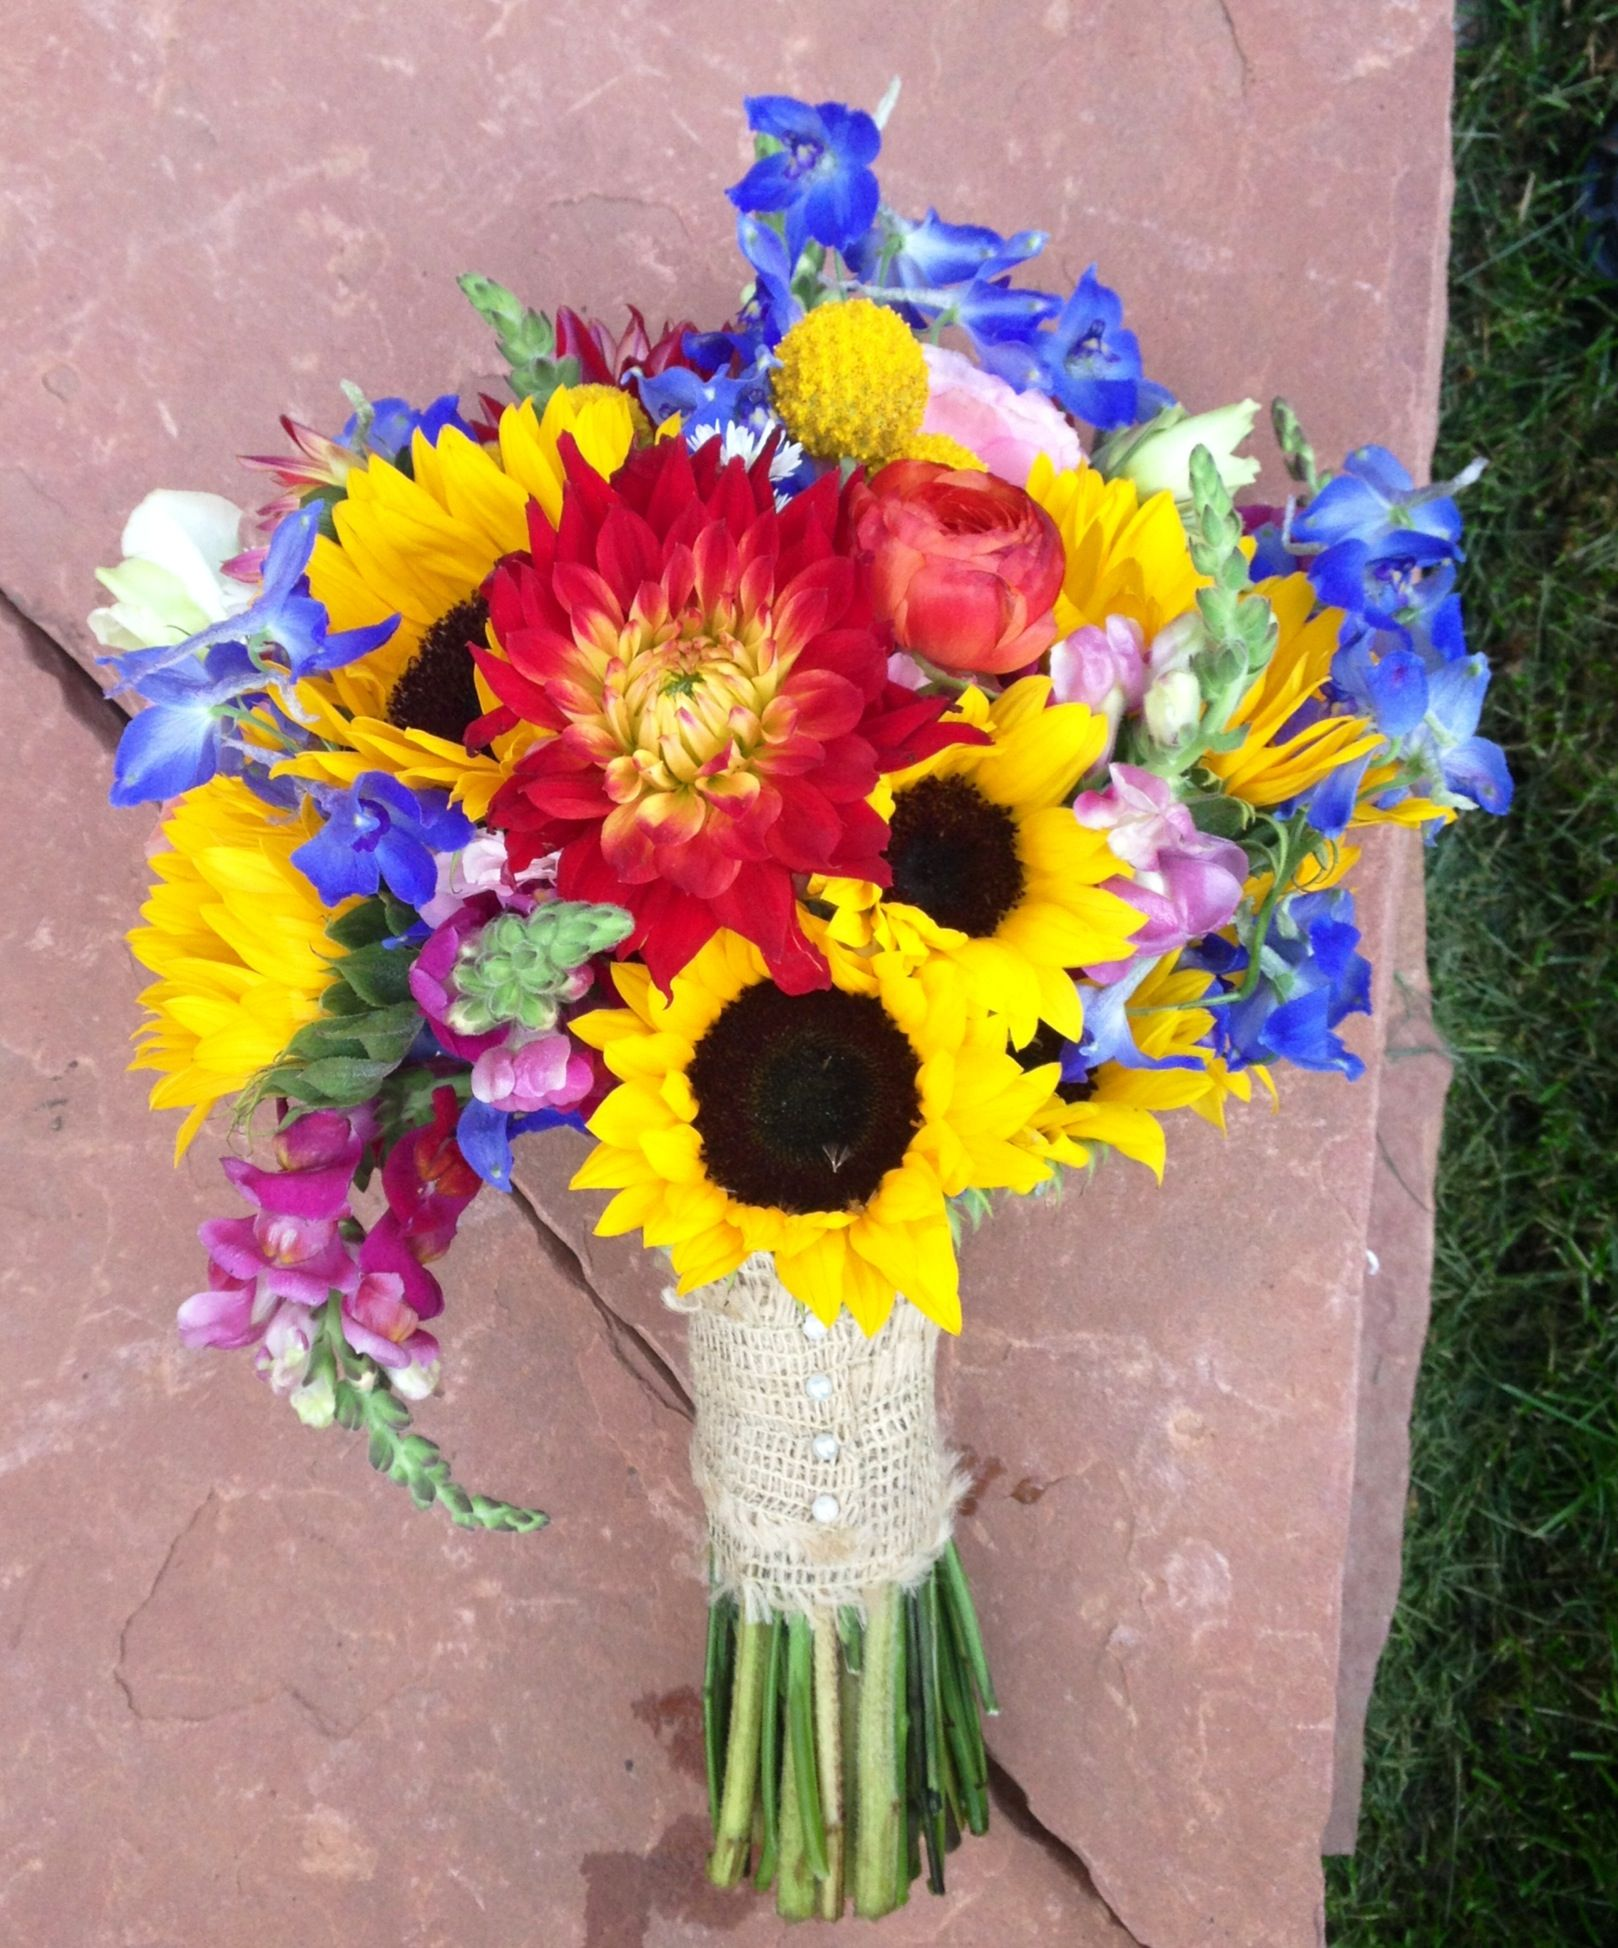 Wild Flowers For Weddings: Sunflower Wedding Bouquet. Wildflower Wedding Bouquet